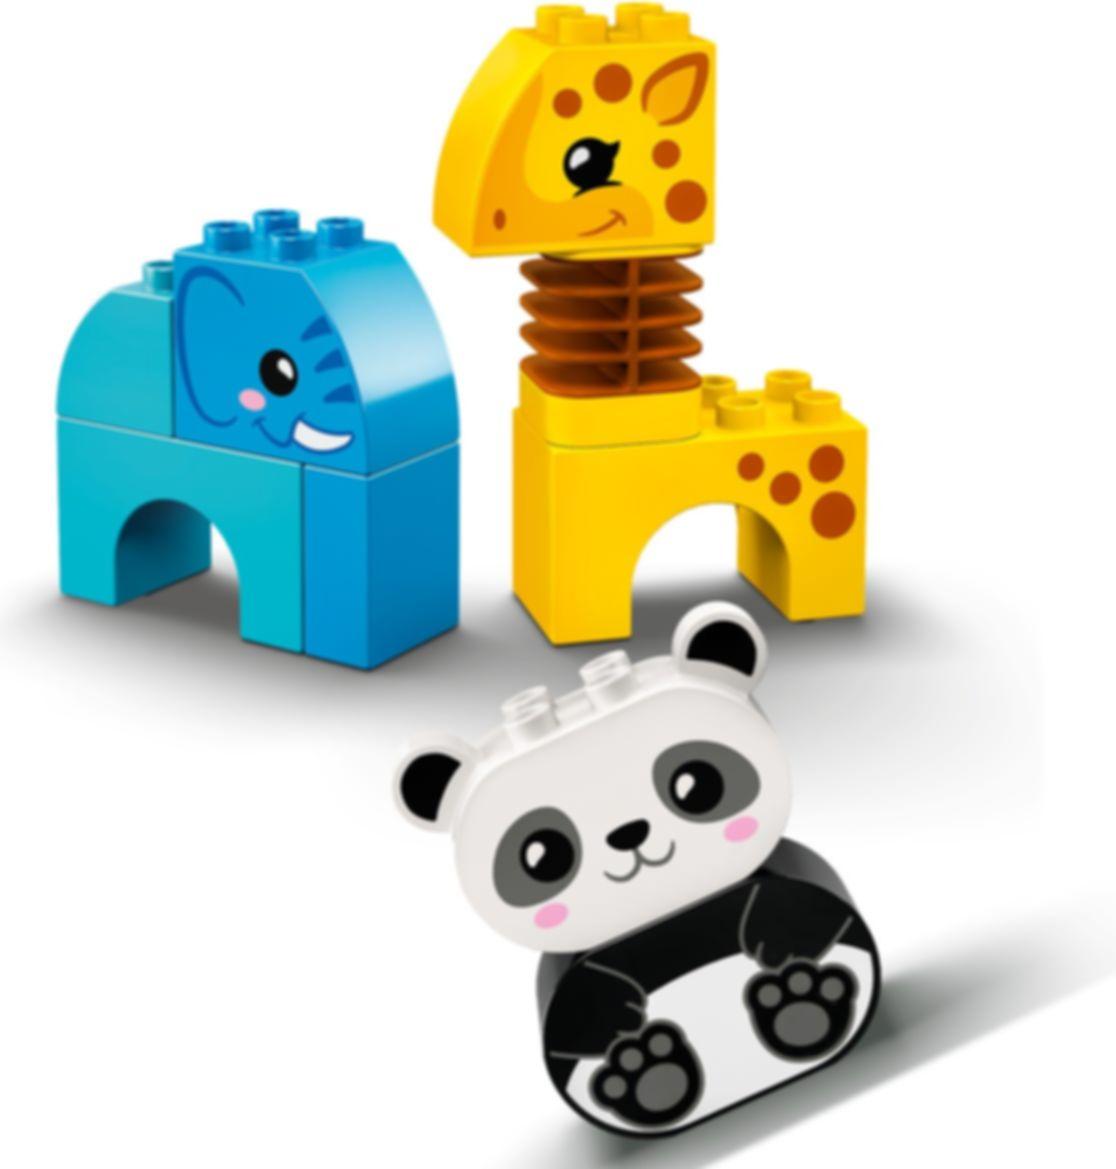 LEGO® DUPLO® Animal Train components